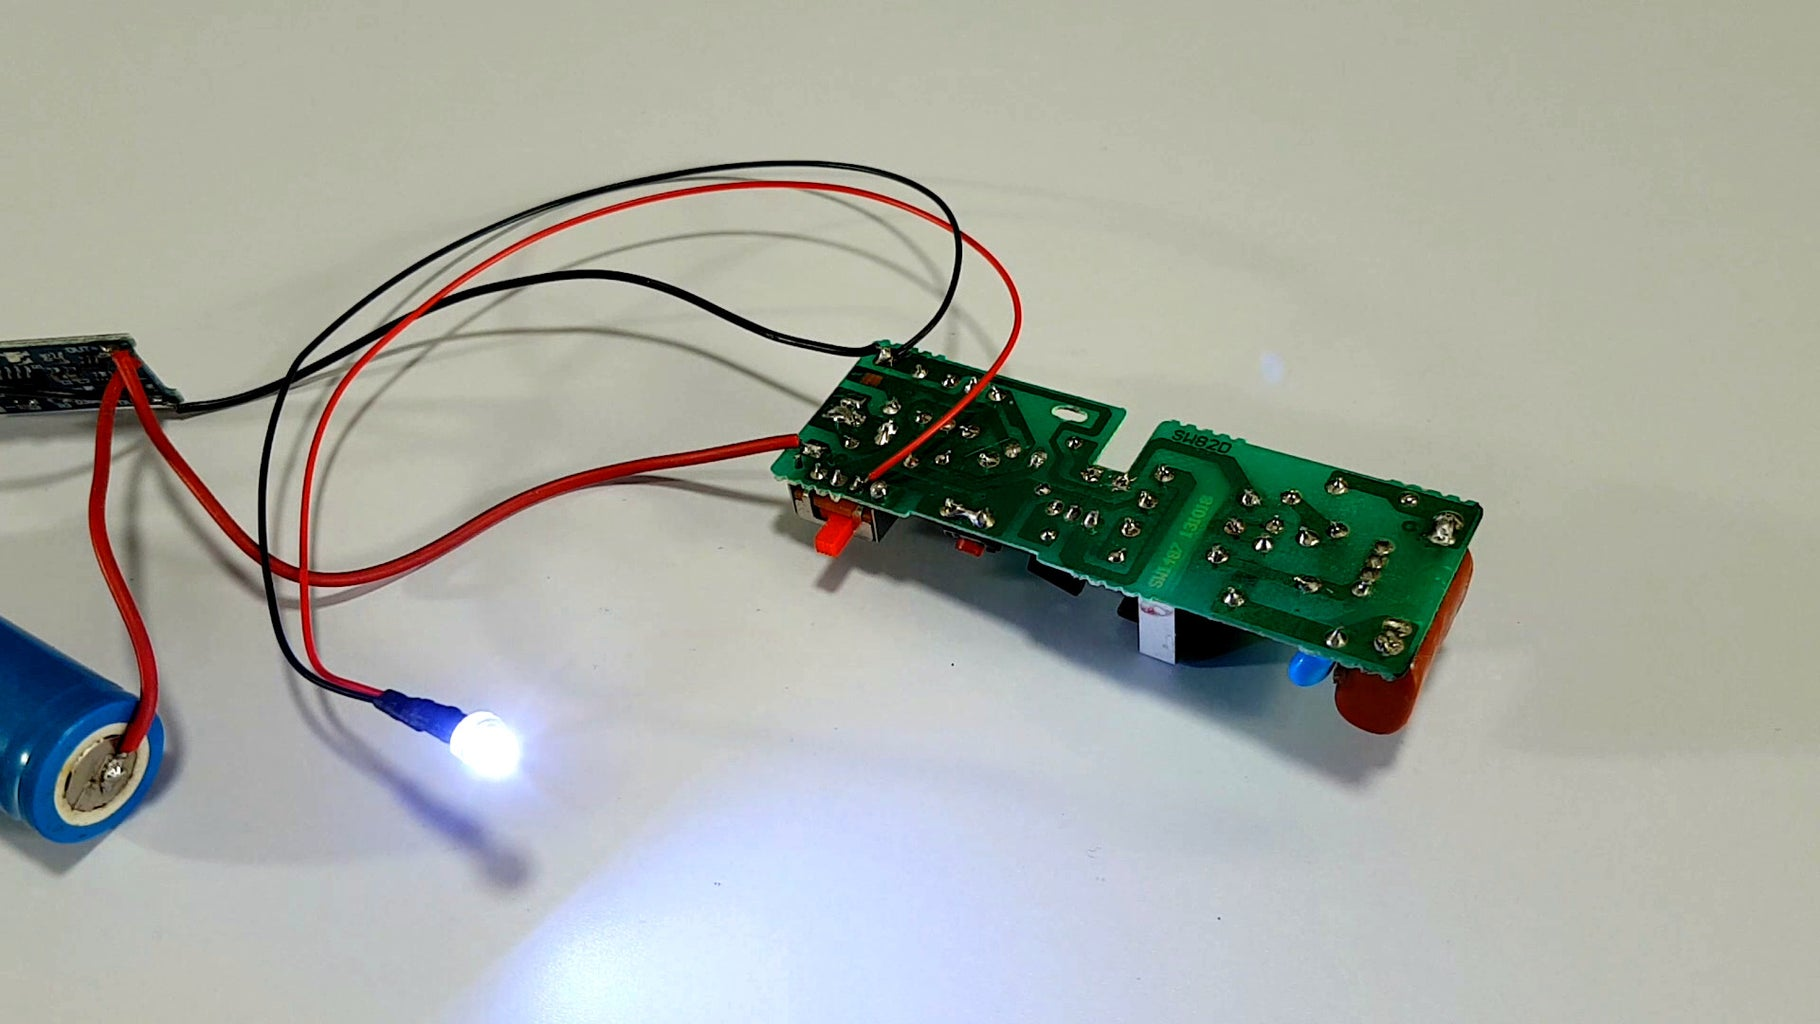 Modify the Circuit Board